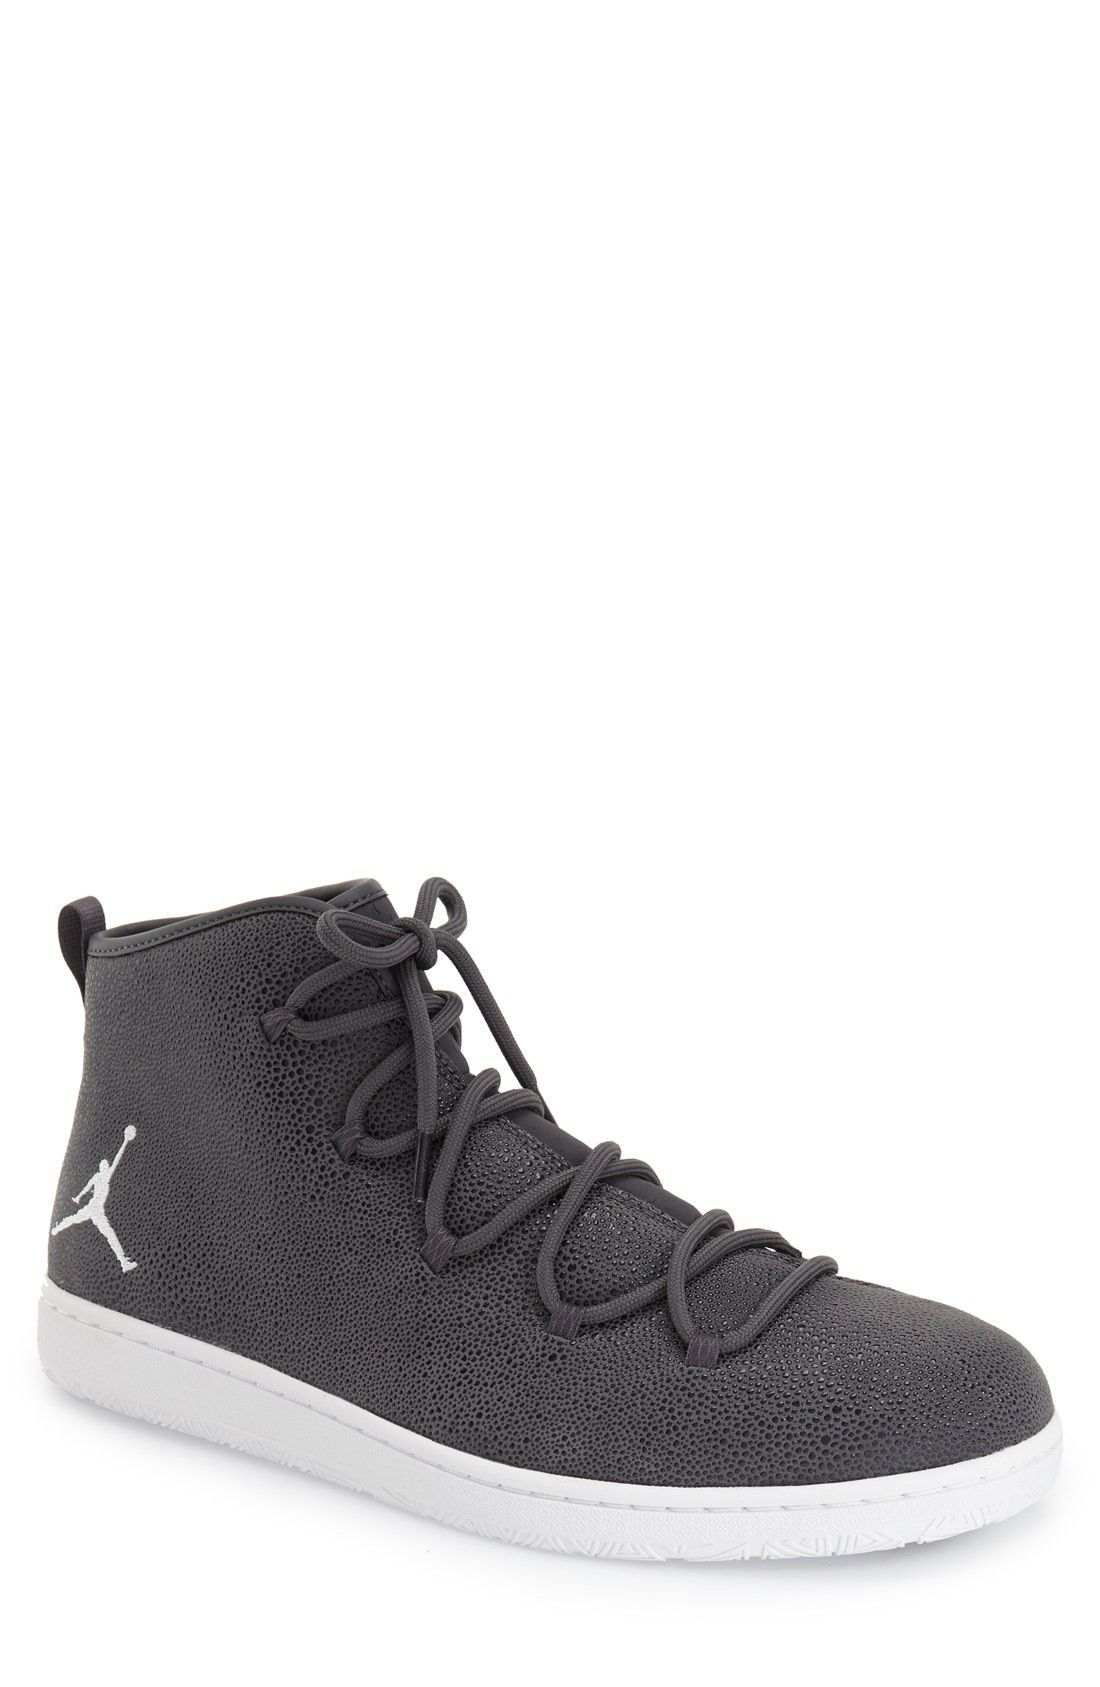 Jordan Galaxy' Sneaker (Men)